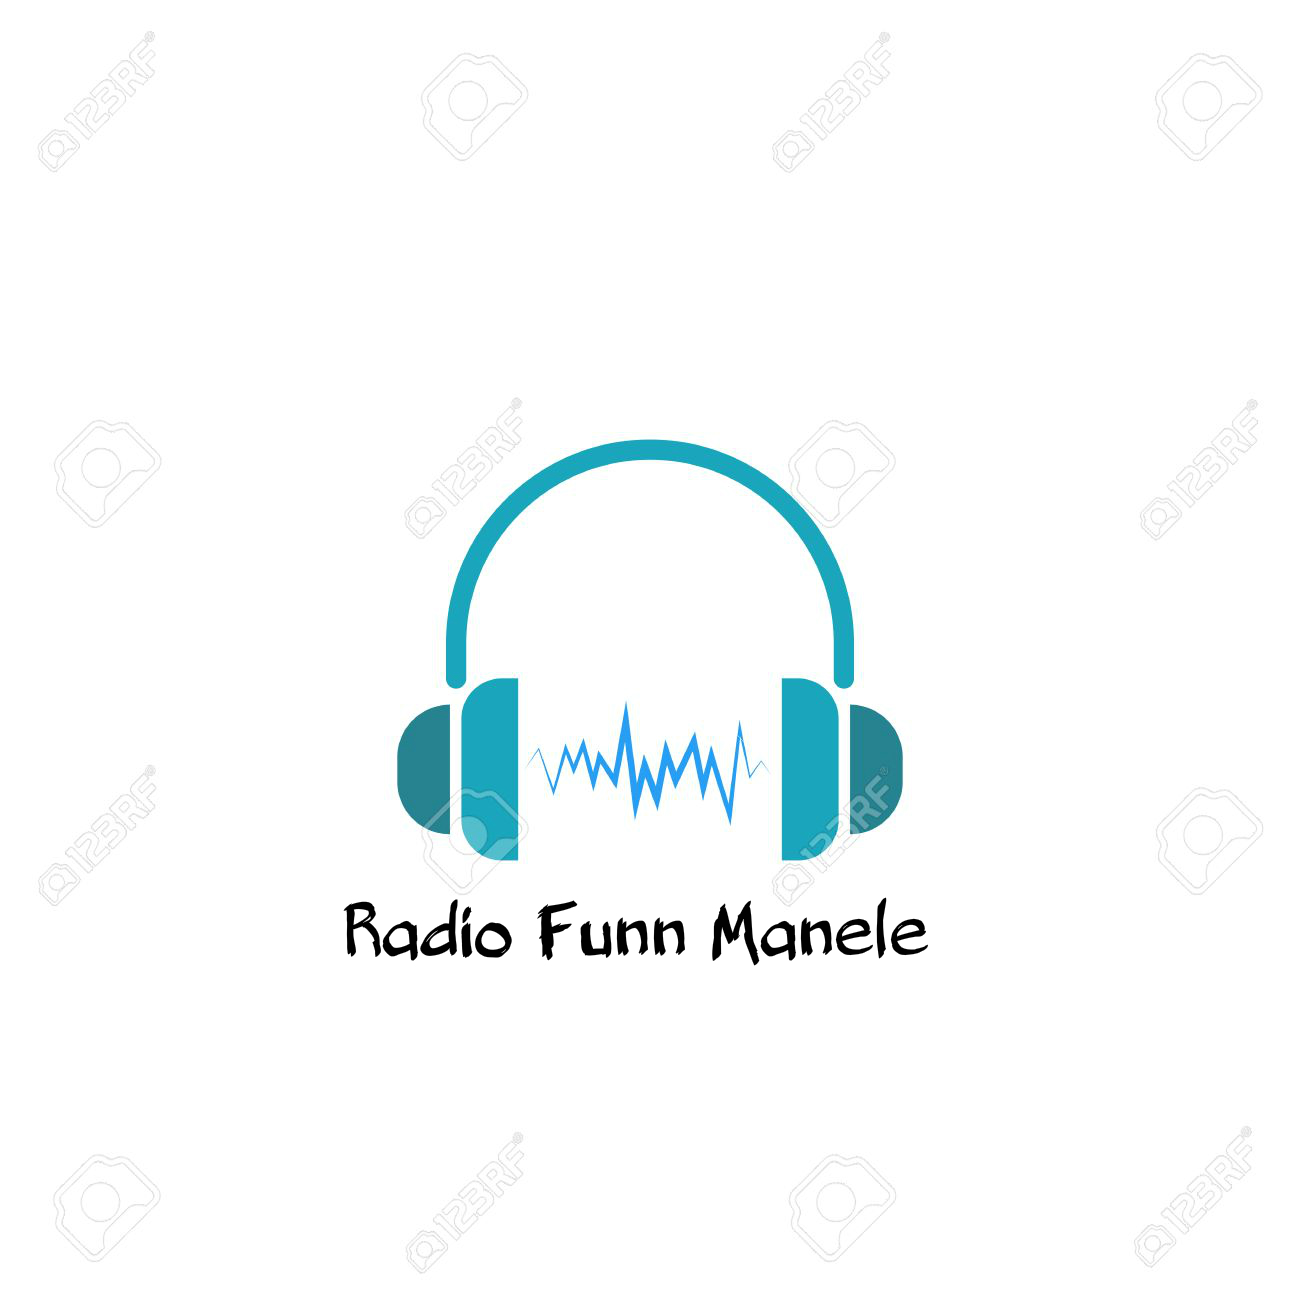 Radio Funn Romania Manele